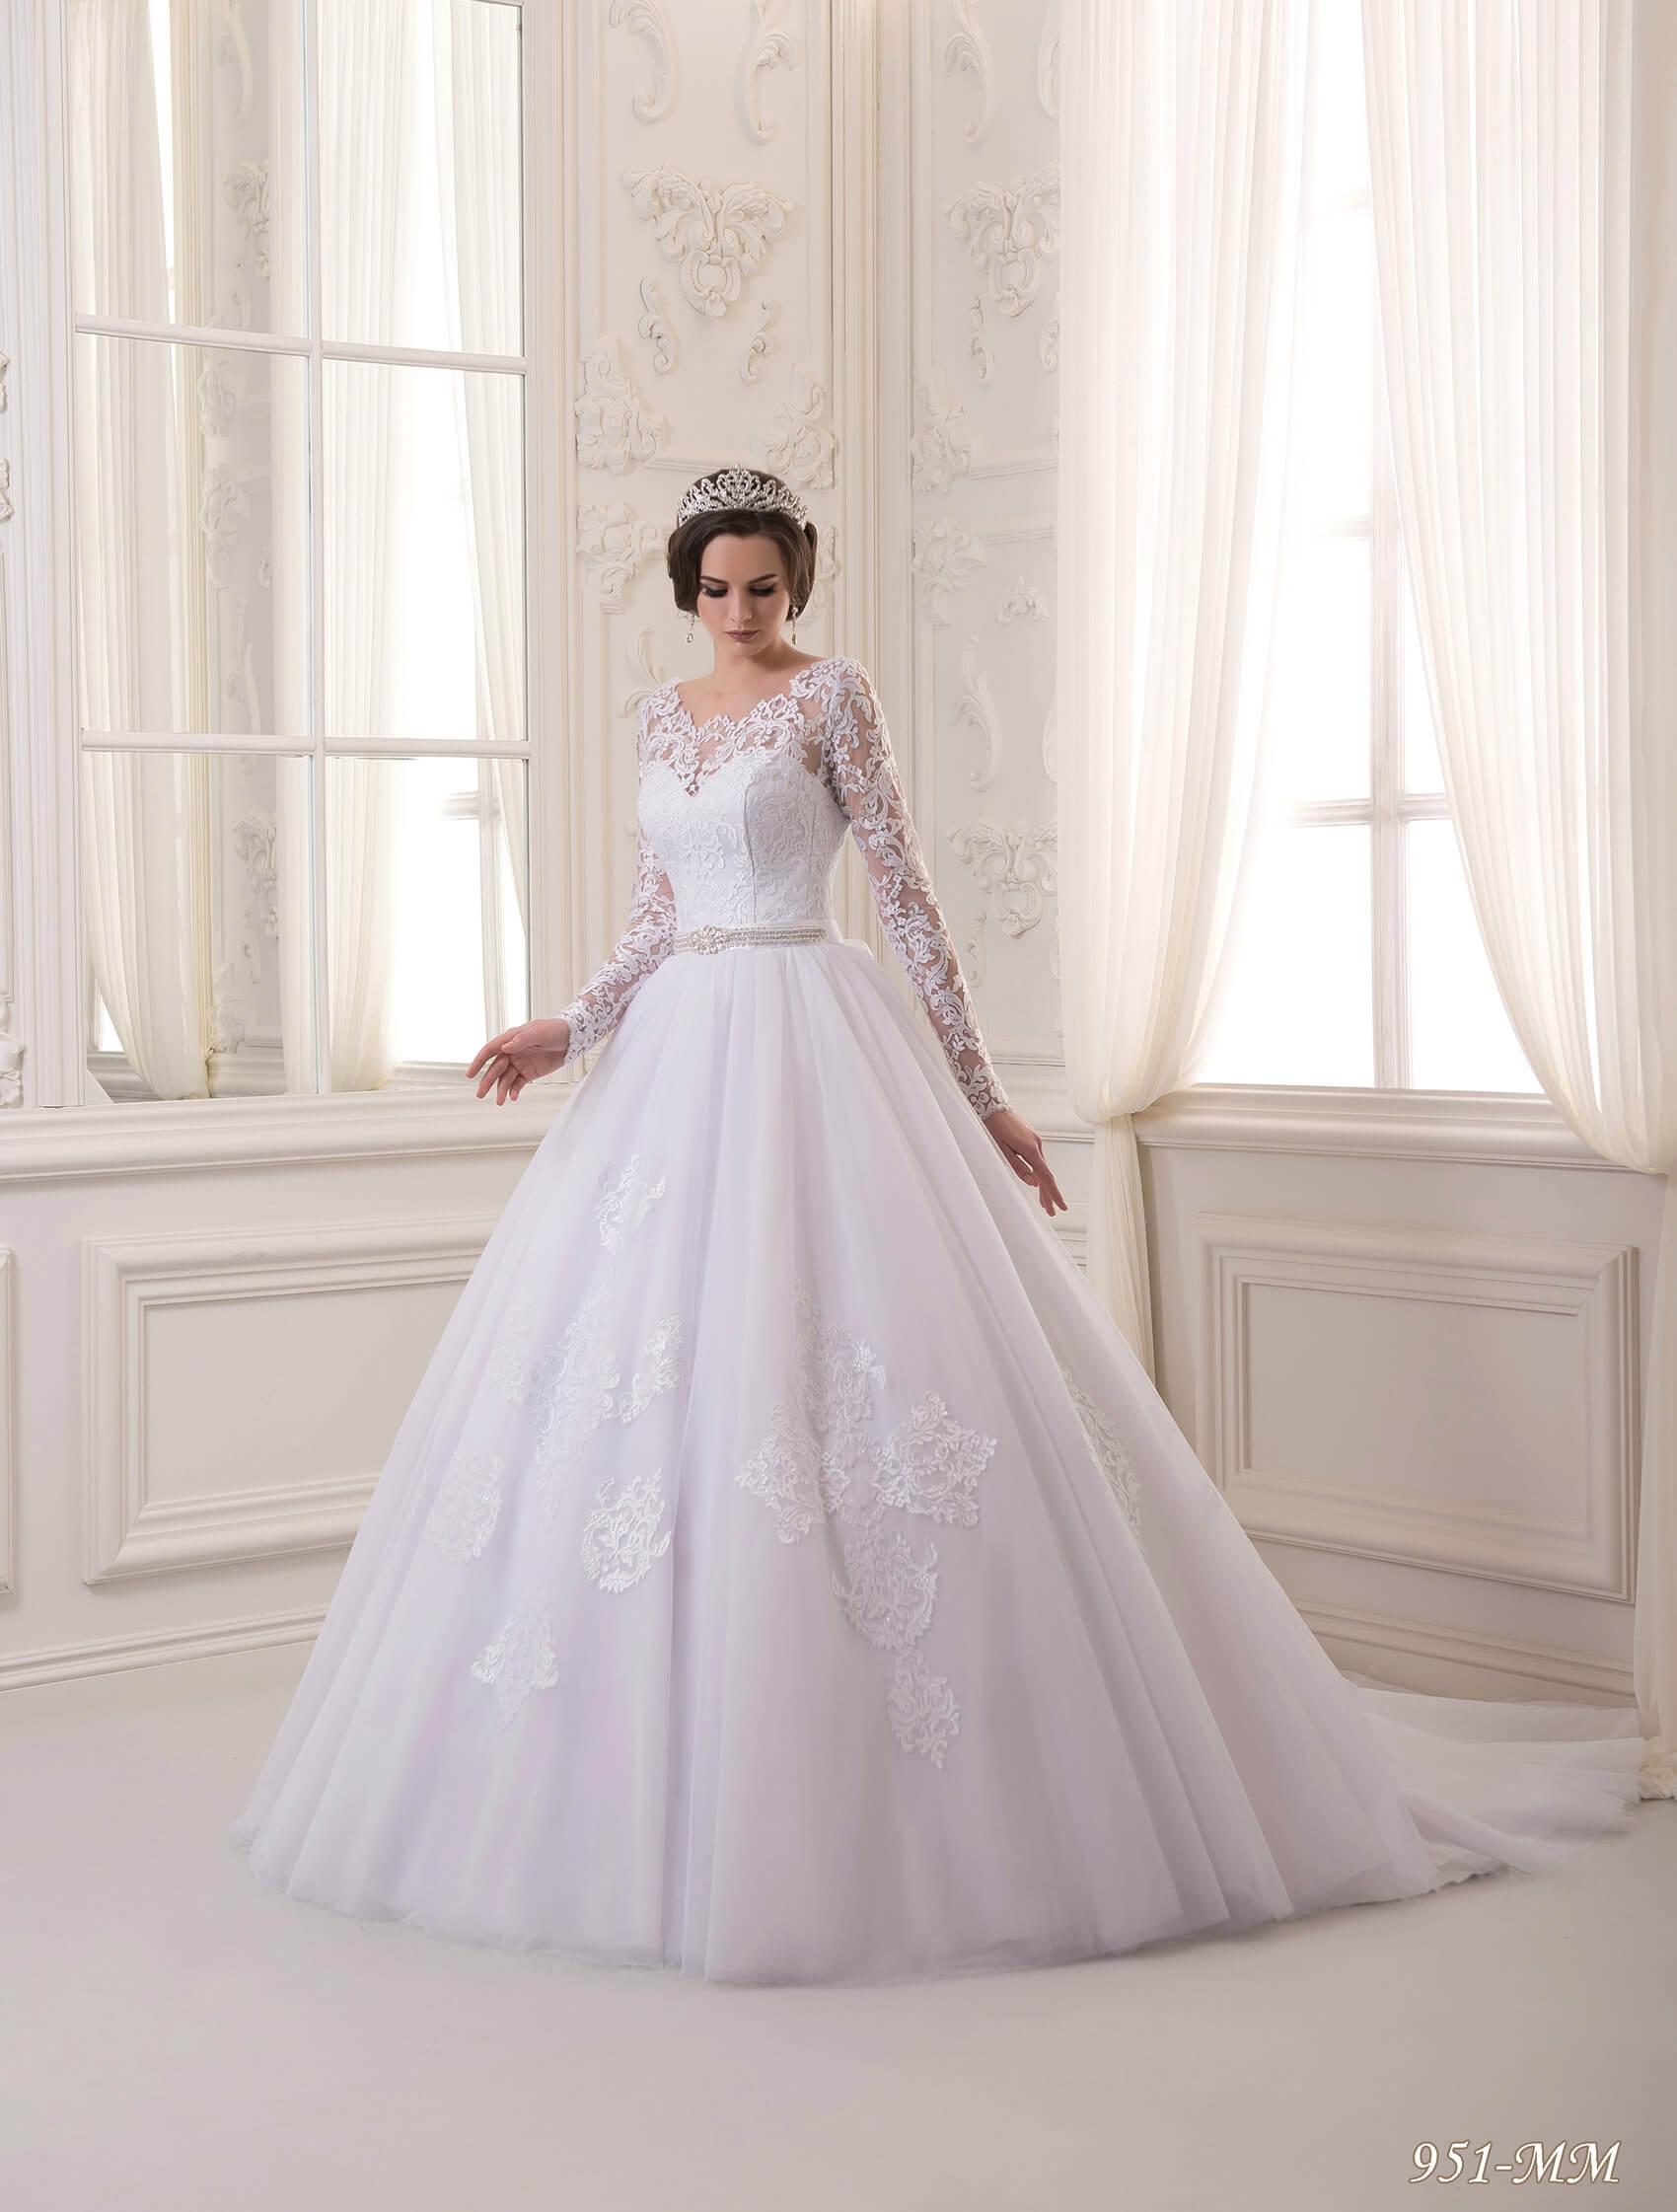 951-MM | Buy wedding dresses wholesale from Pentelei